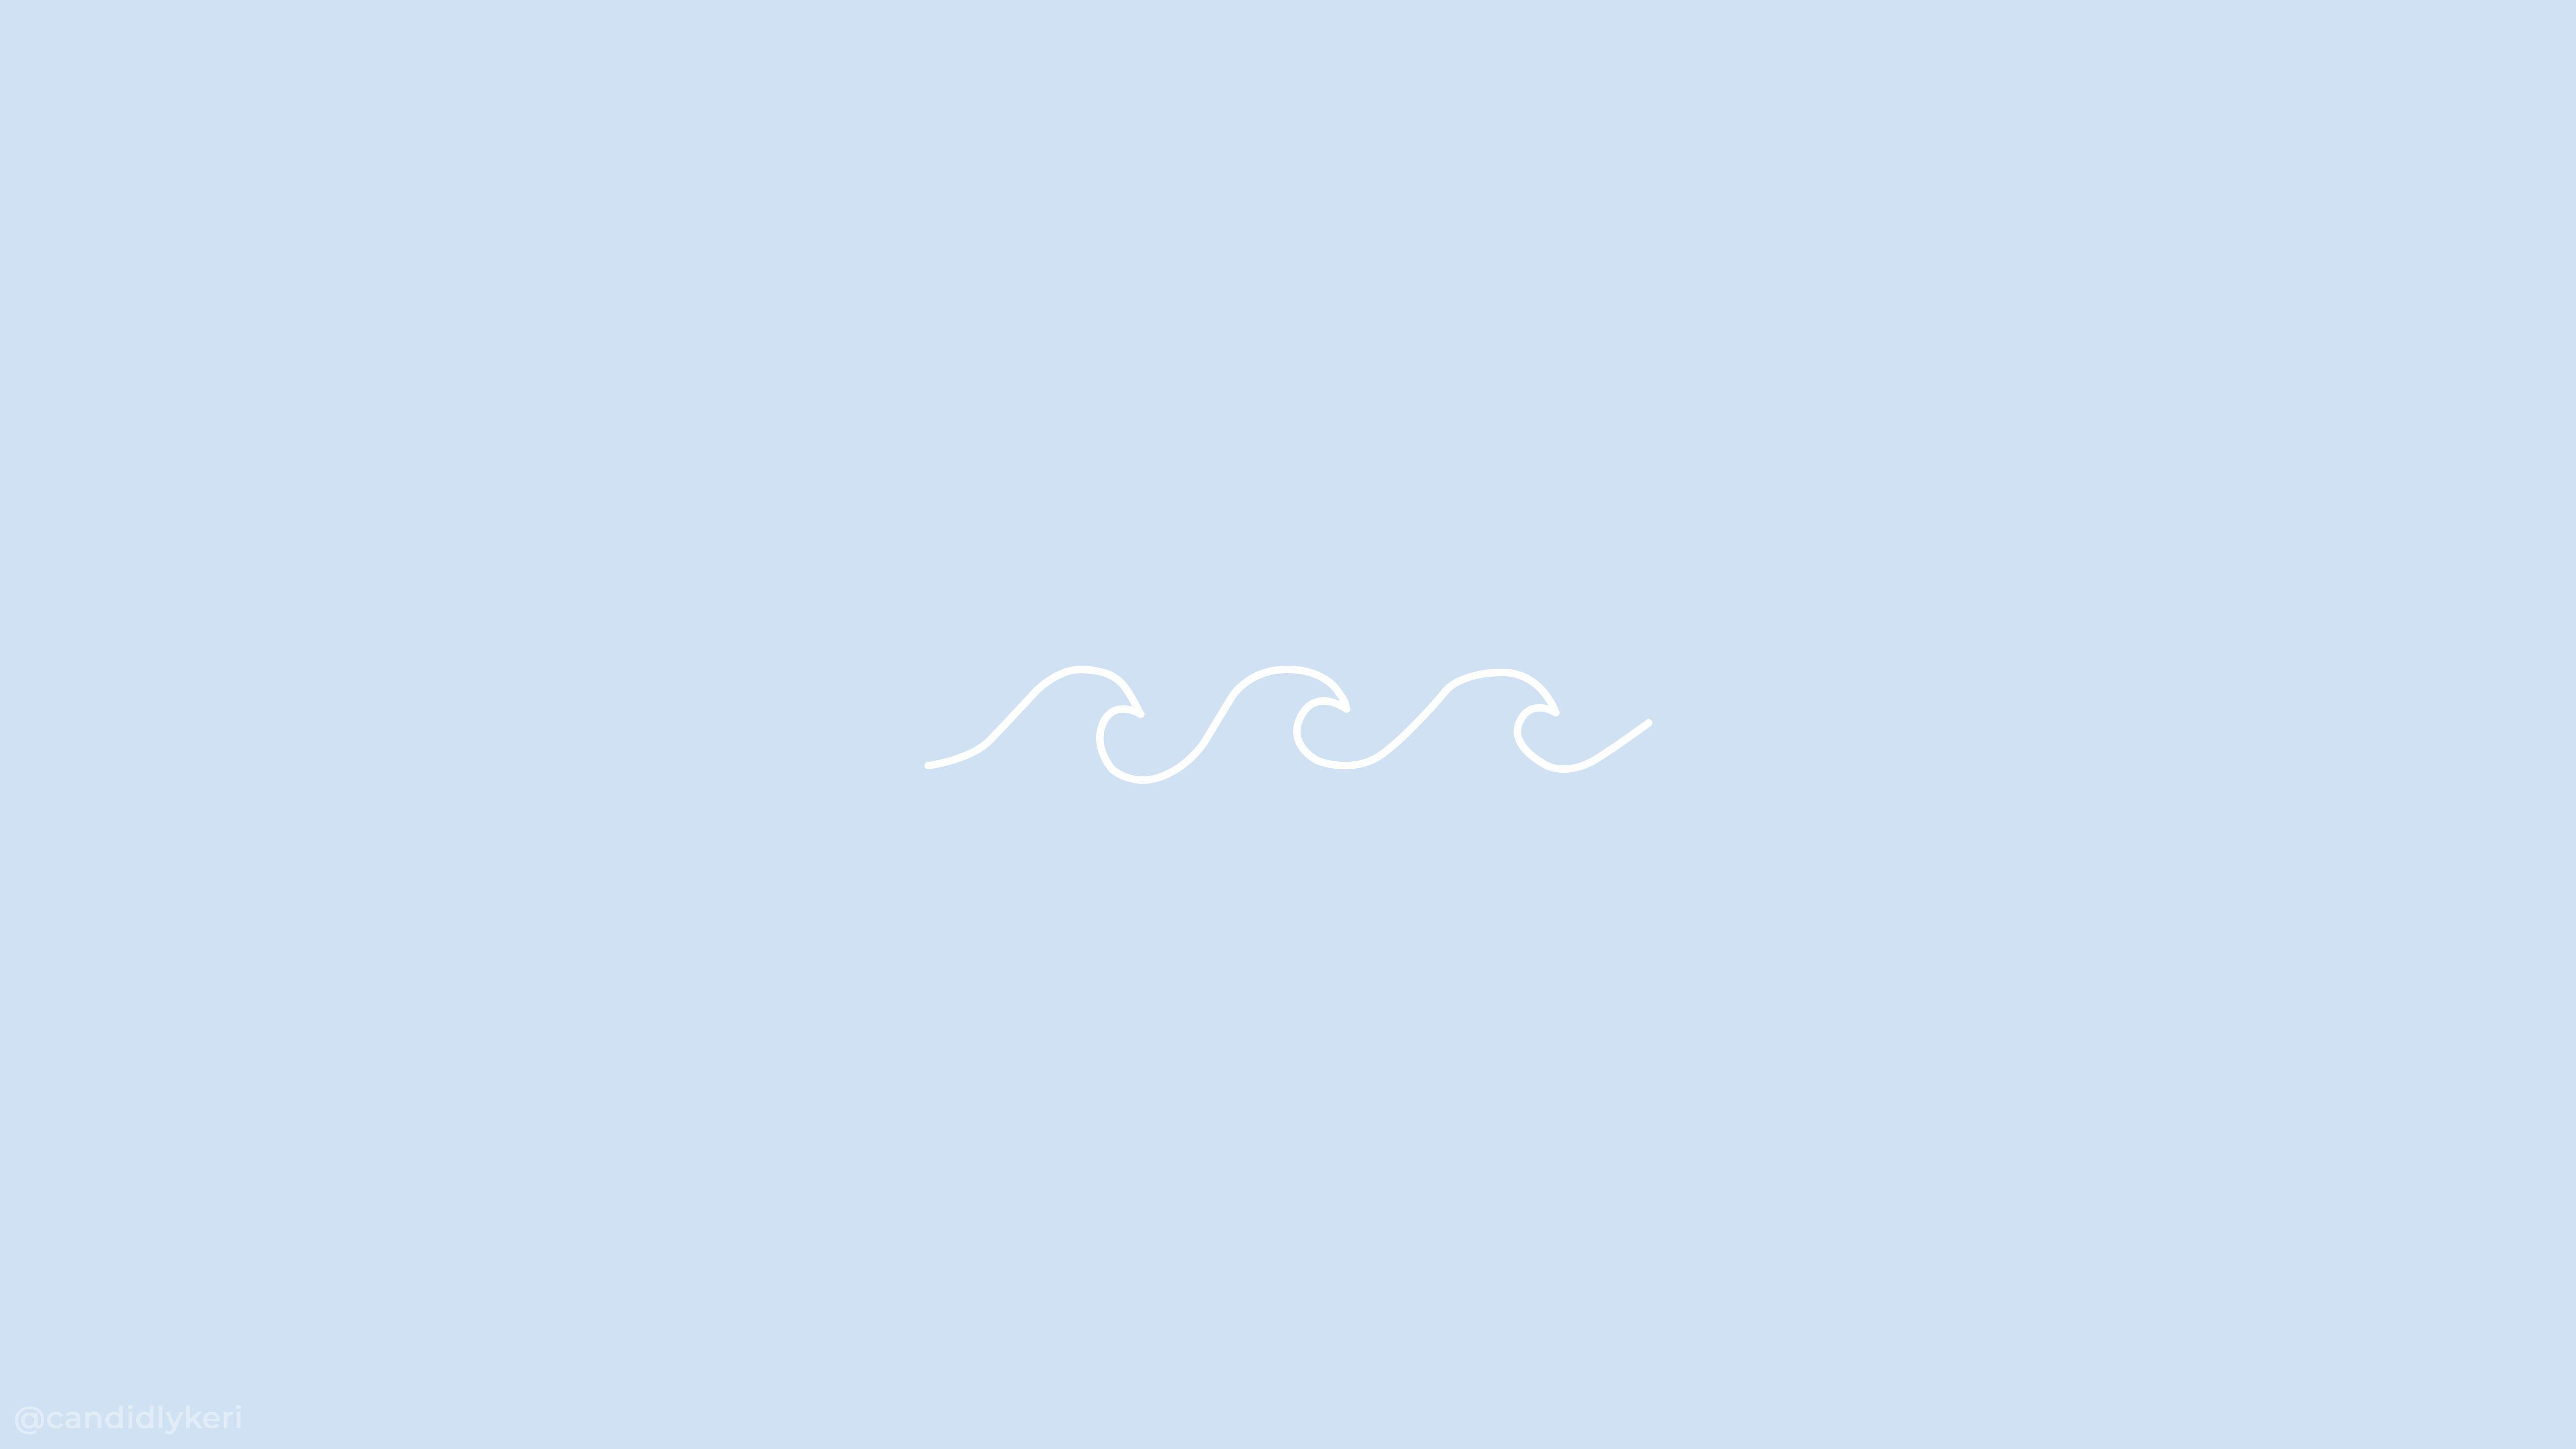 Blue Aesthetic Mac Wallpapers Top Free Blue Aesthetic Mac